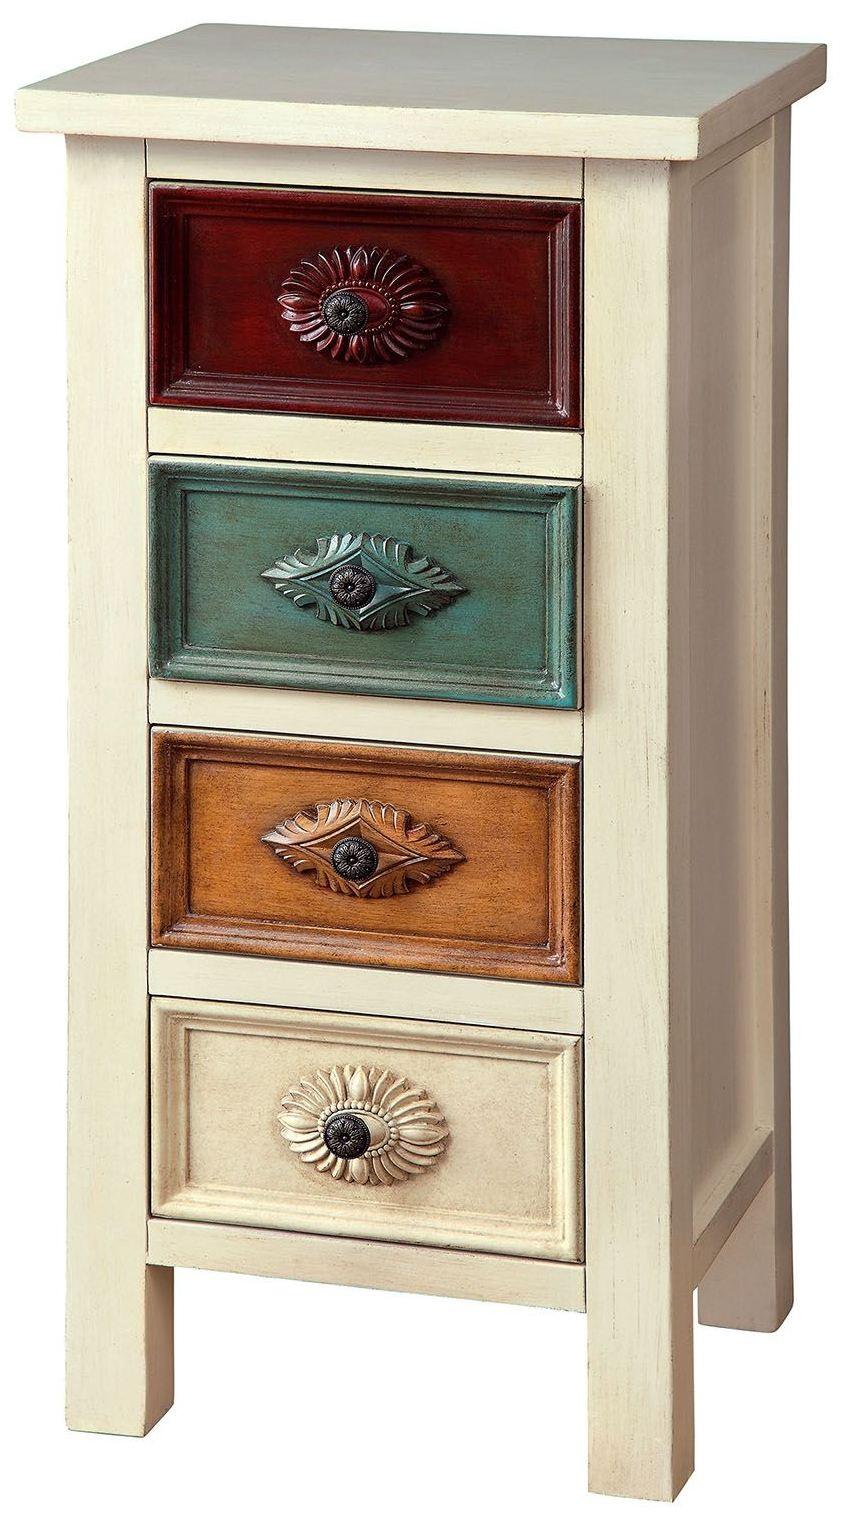 Shari antique white hallway cabinet cm ac305 furniture for Antique white usa kitchen cabinets